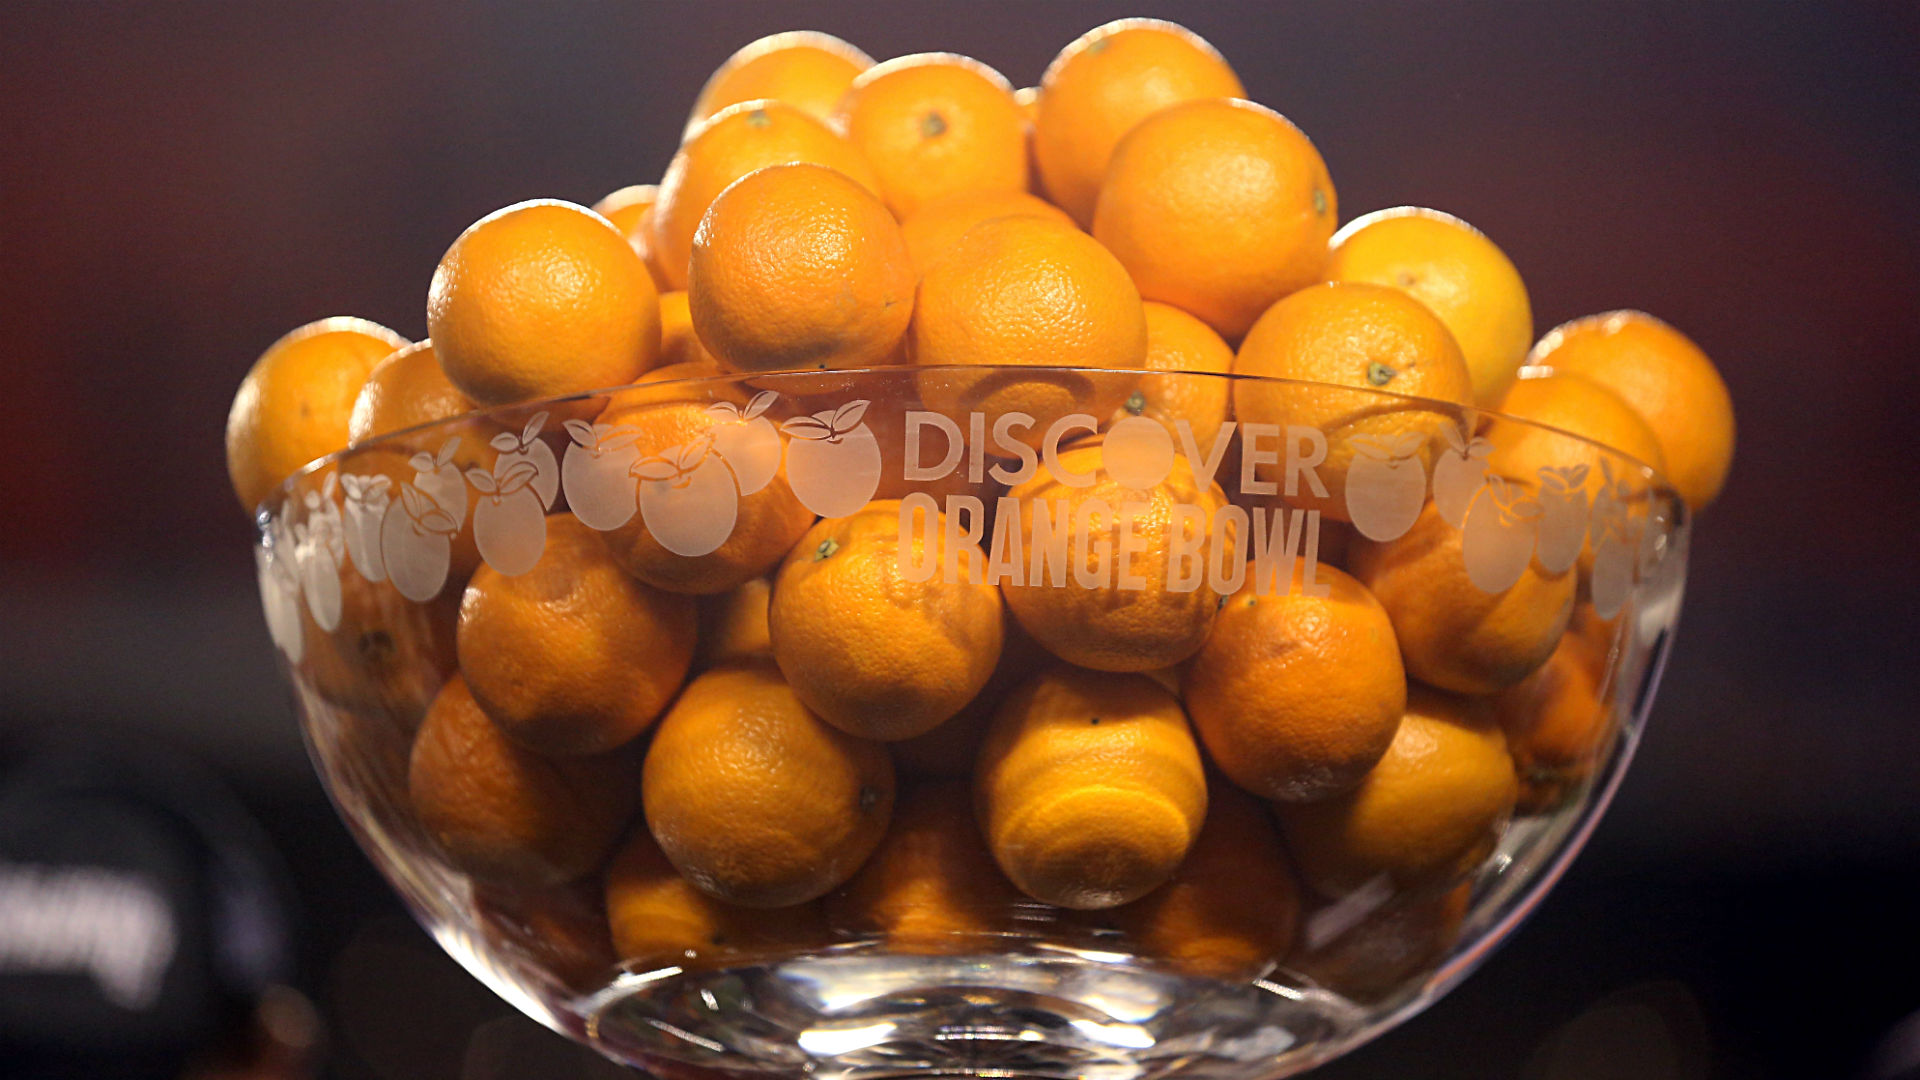 Orange-bowl-121118-usnews-getty-ftr_j85xbkakkots1g7j0ccz3em0r